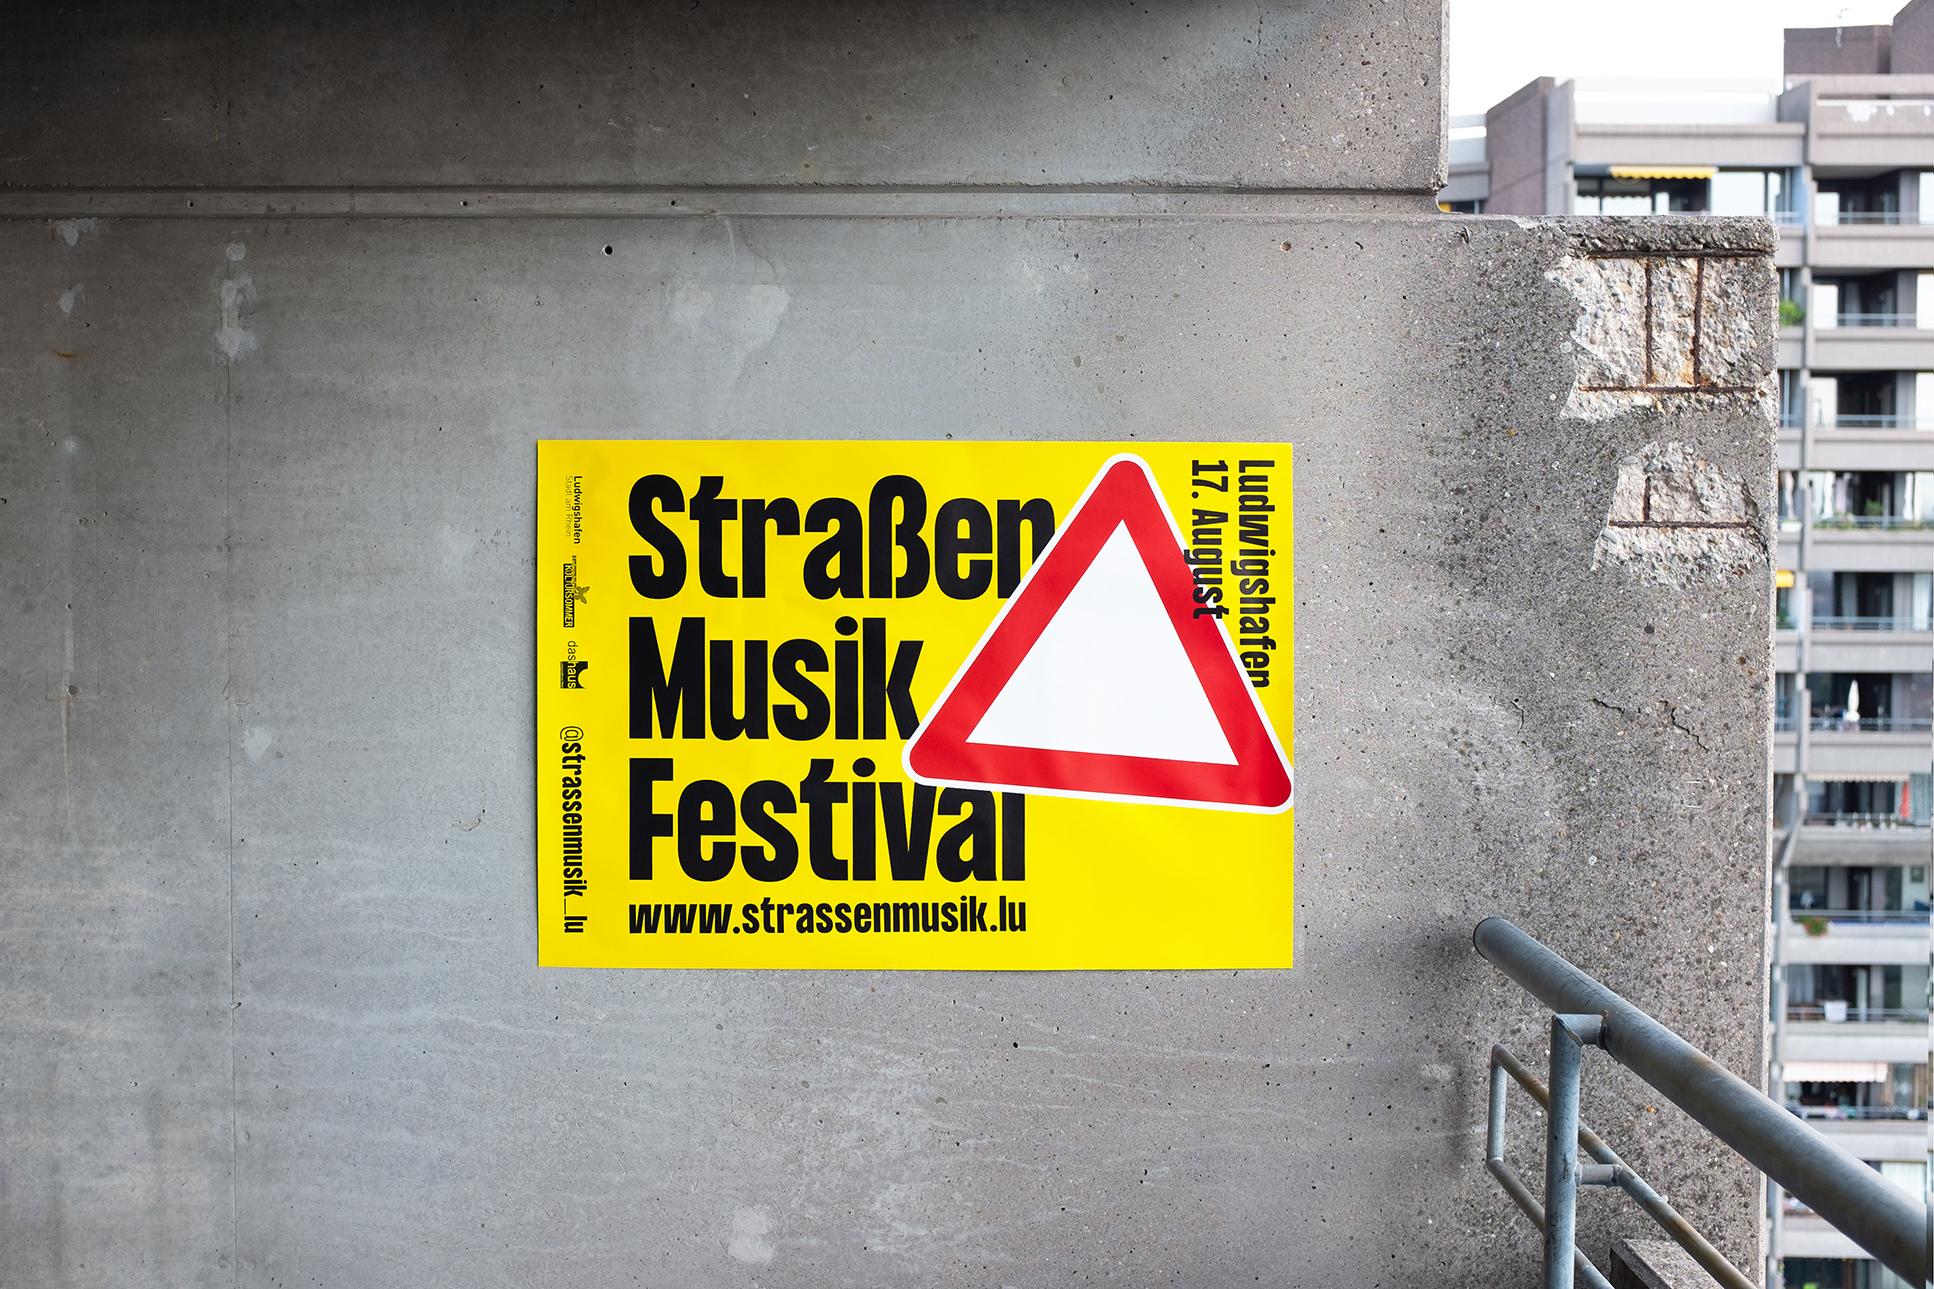 Strassenmusikfestival Ludwigshafen